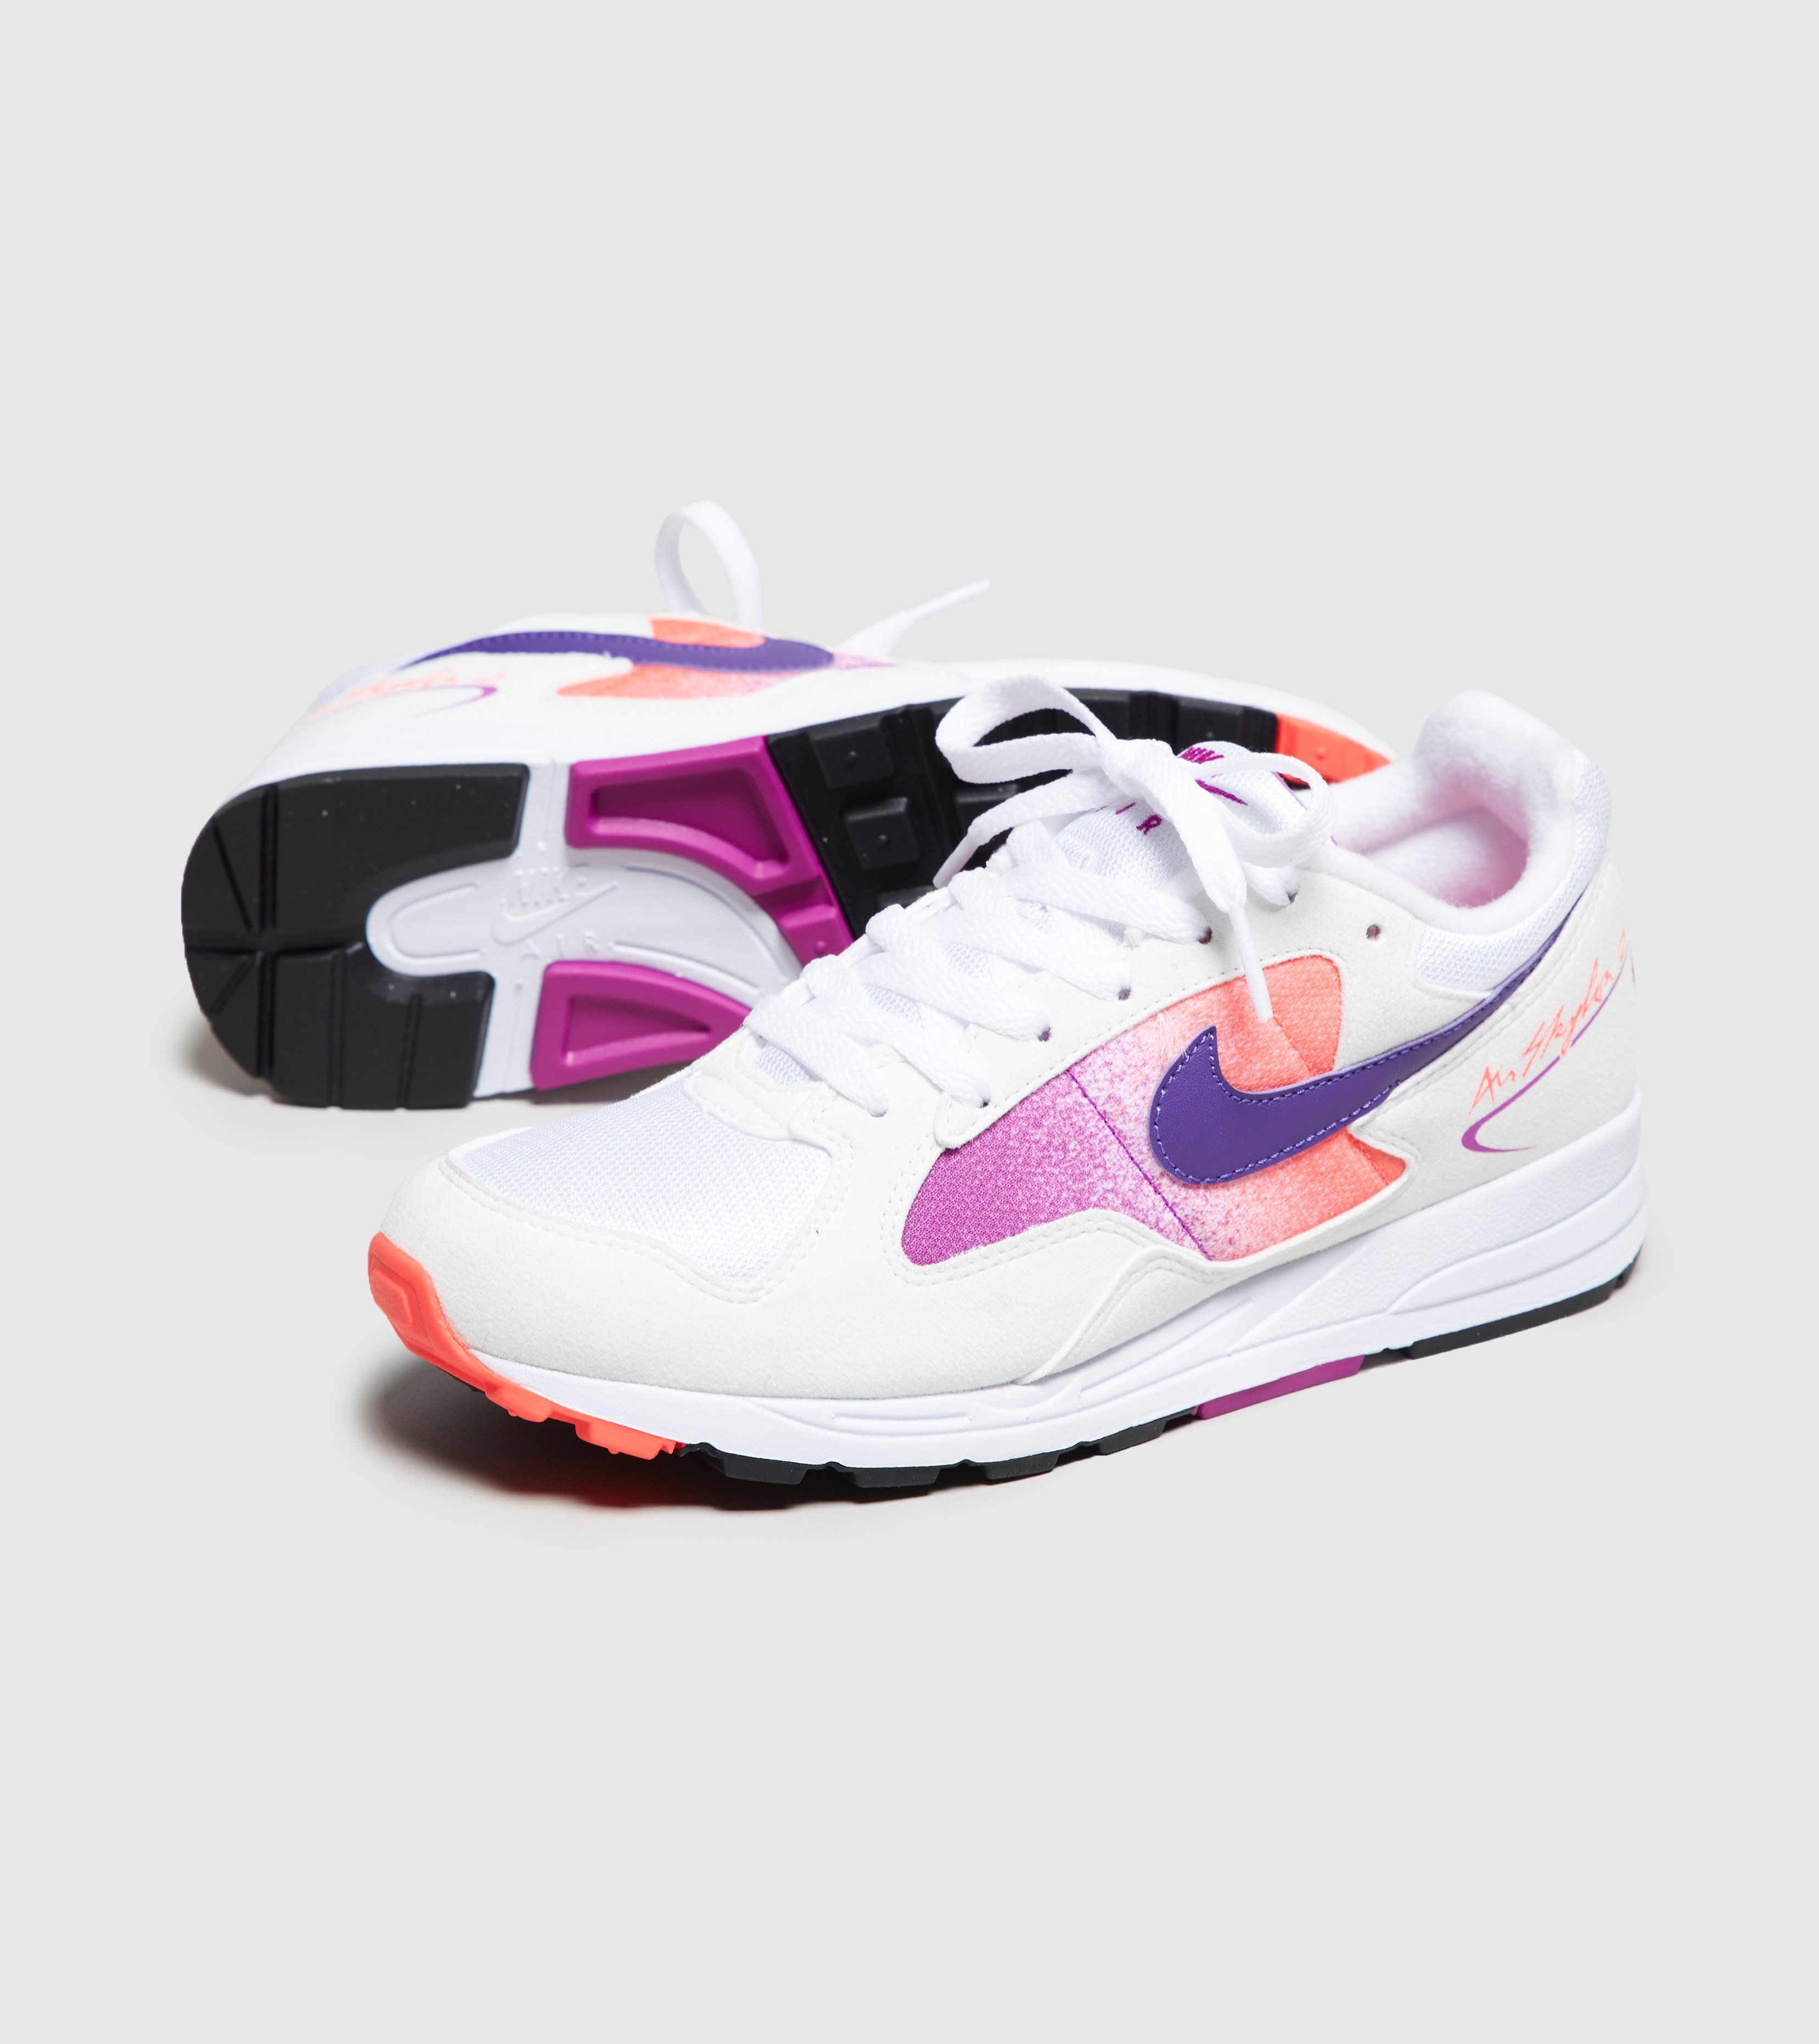 Nike Air Skylon Women's